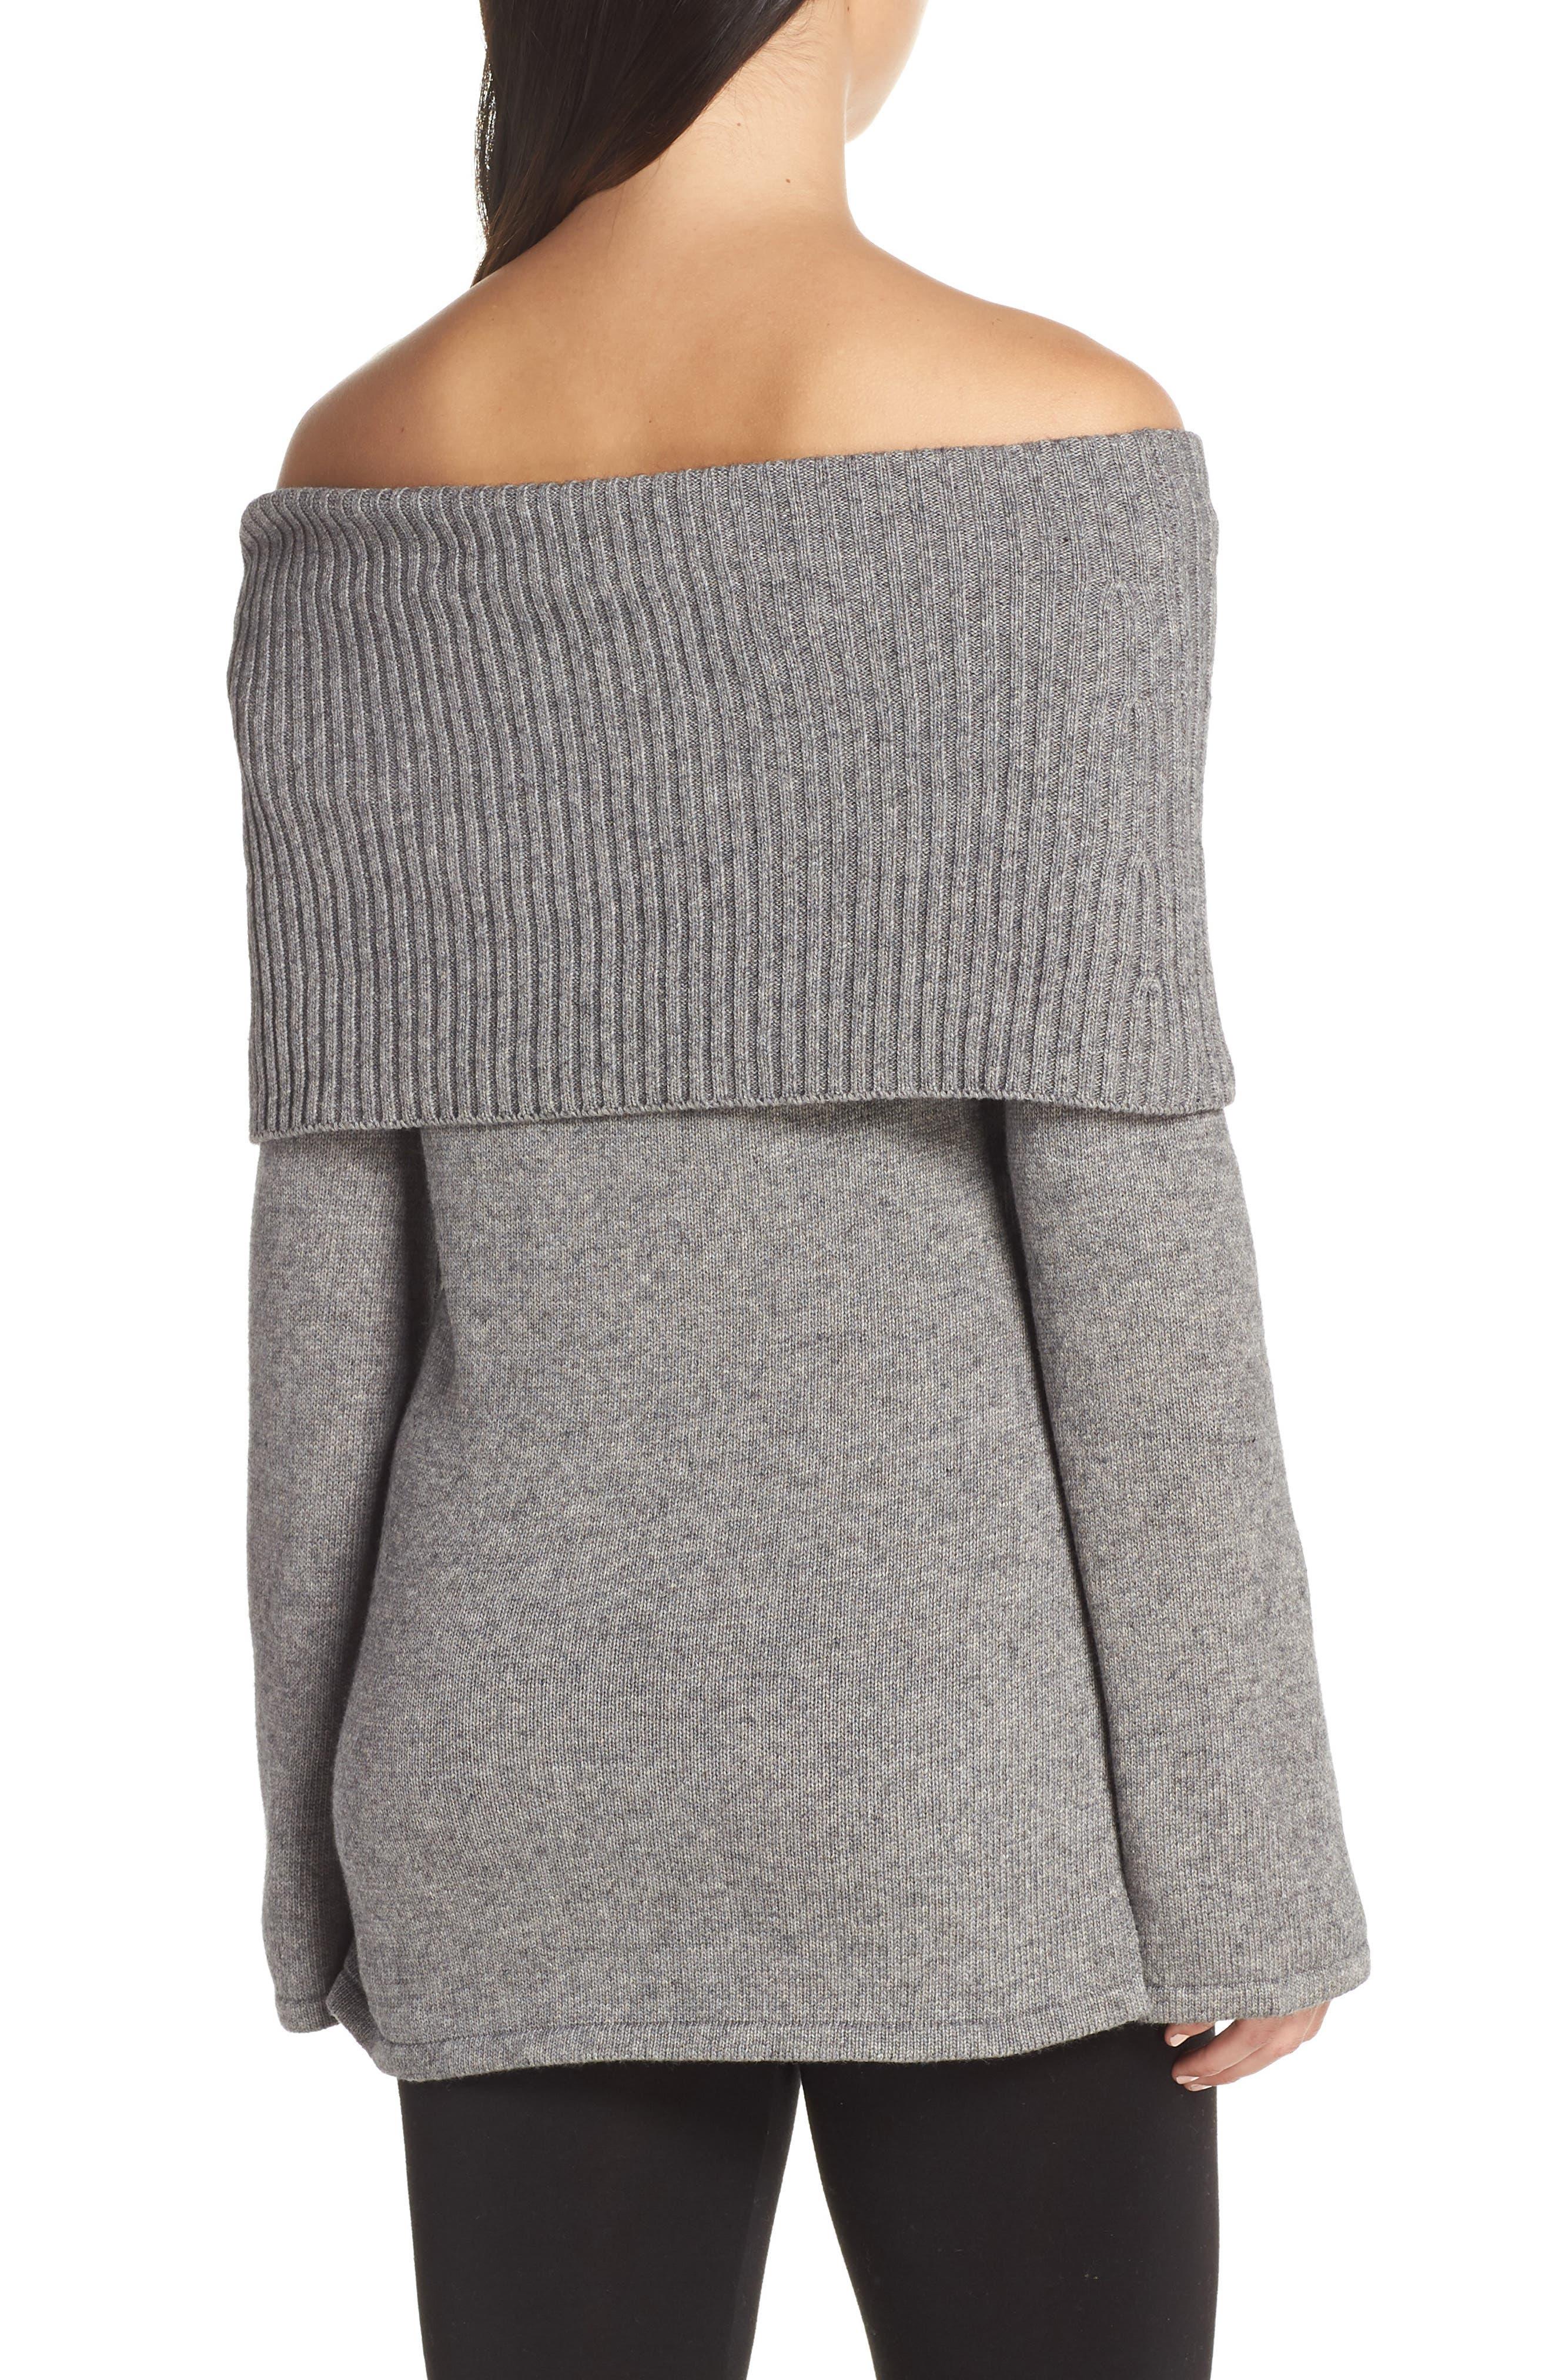 Rhodyn Off The Shoulder Sweater,                             Alternate thumbnail 2, color,                             GREY HEATHER